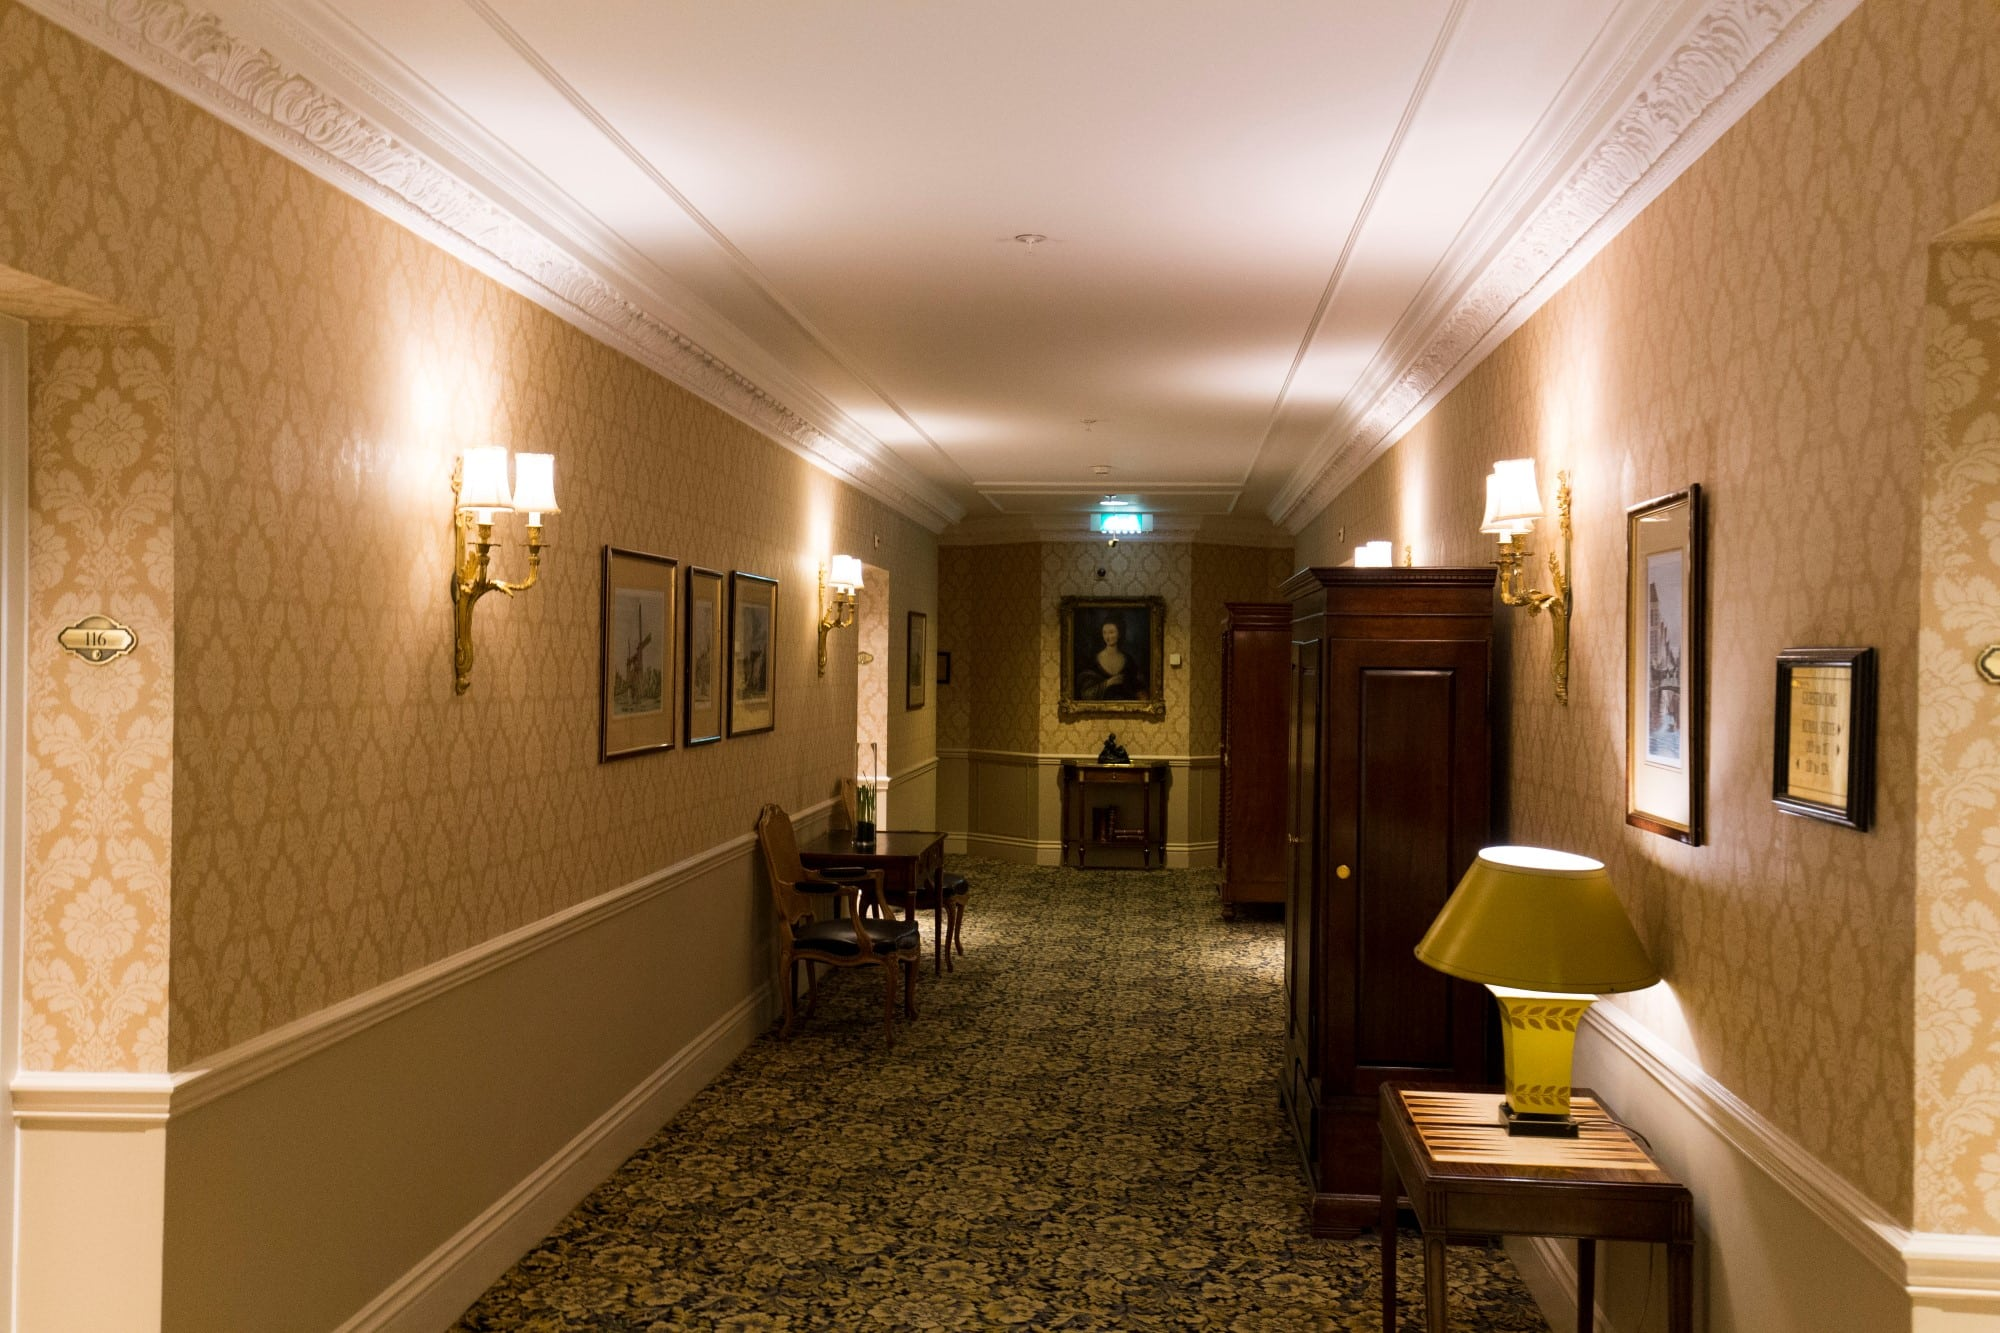 Amstel hotel intercontinental amsterdam netherlands - Amstel hotel amsterdam ...